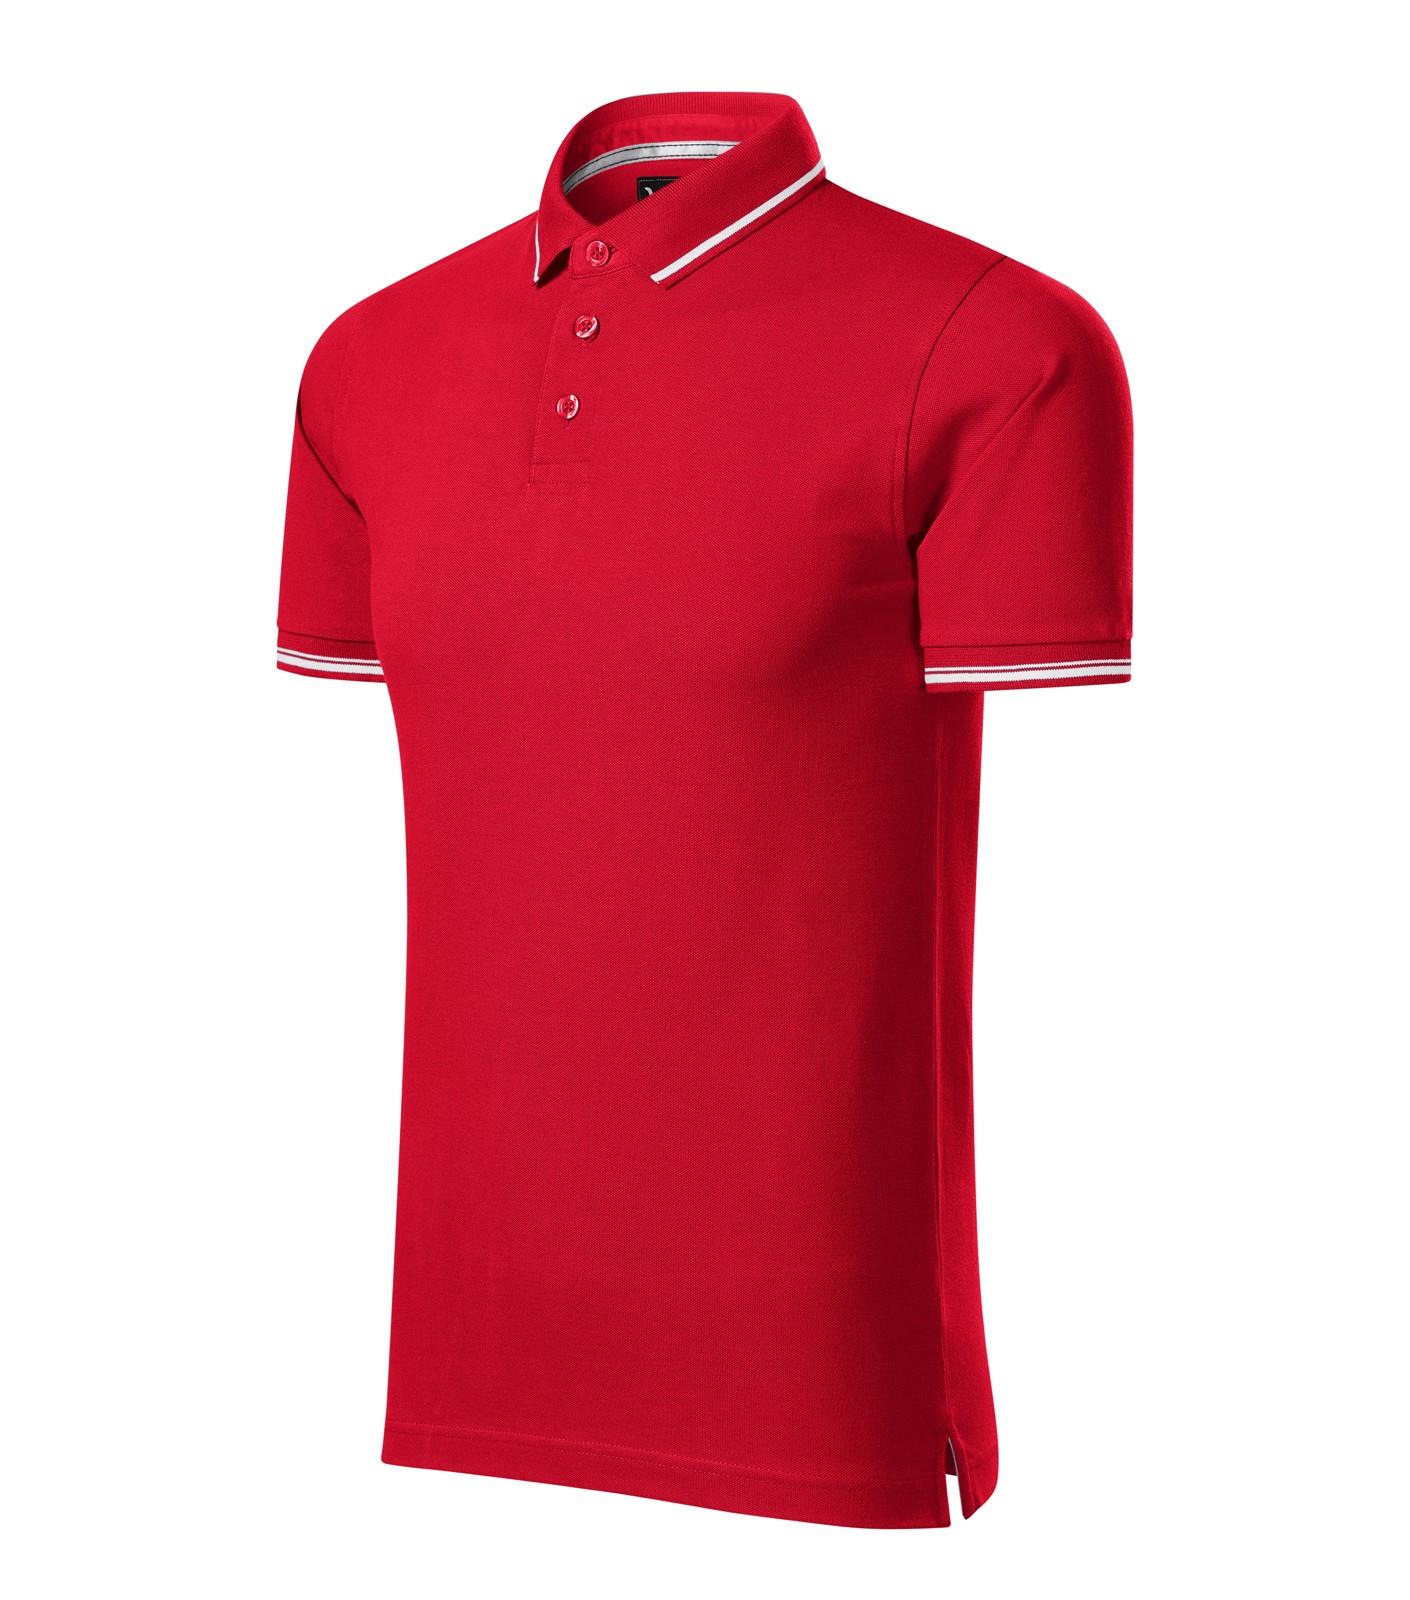 Polo Shirt men's Malfinipremium Perfection plain - Formula Red / L